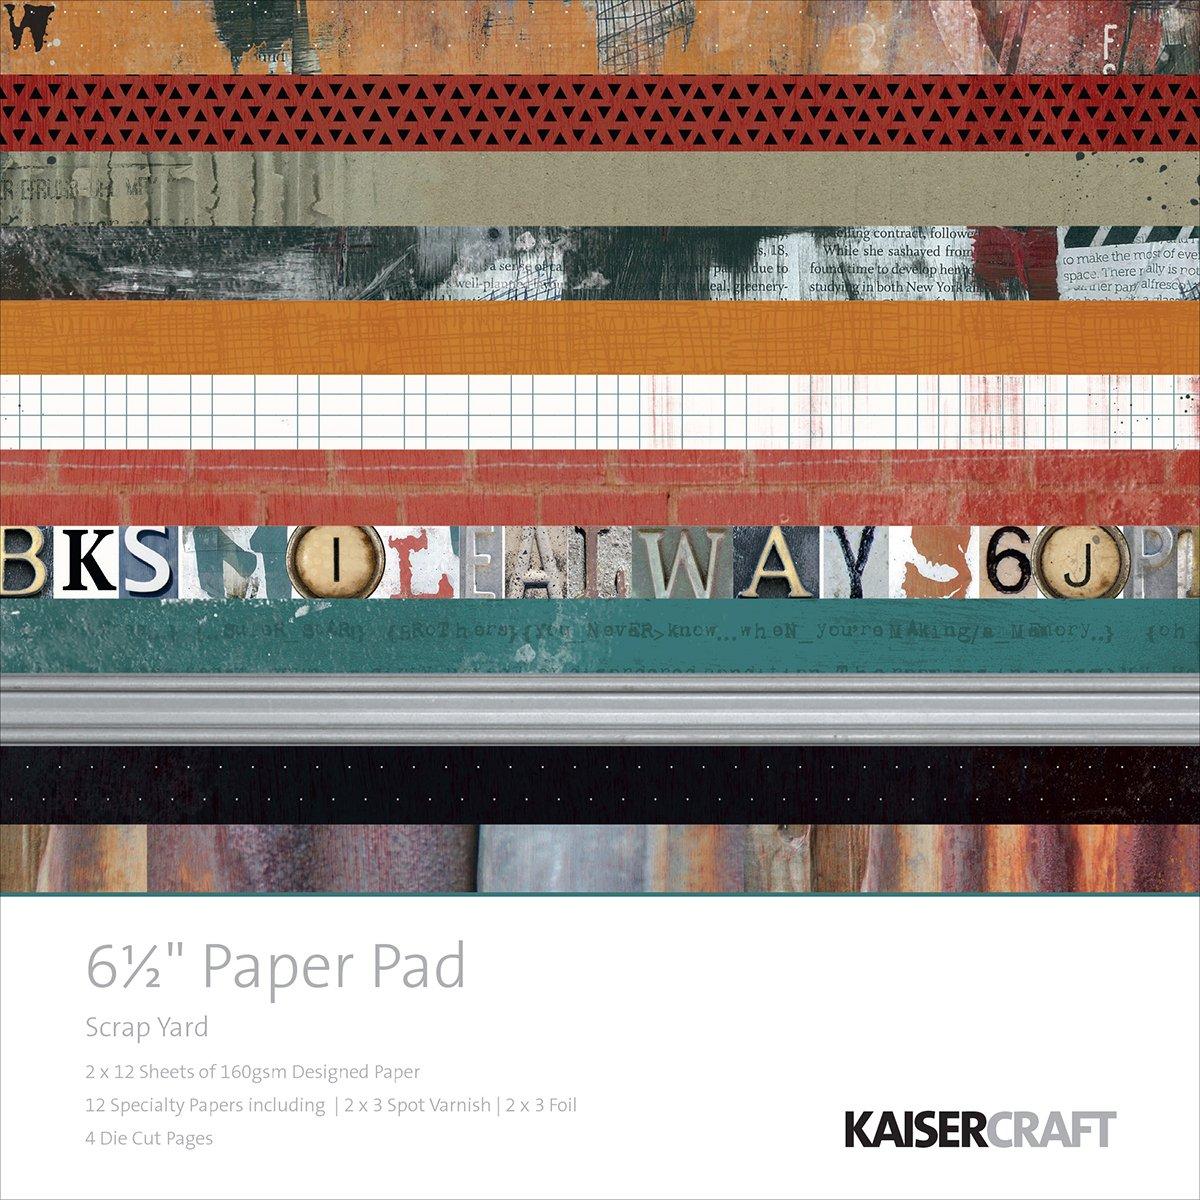 Kaiser Craft 6,5 Little One Papier Pad B00W8HFID2 | Online Store